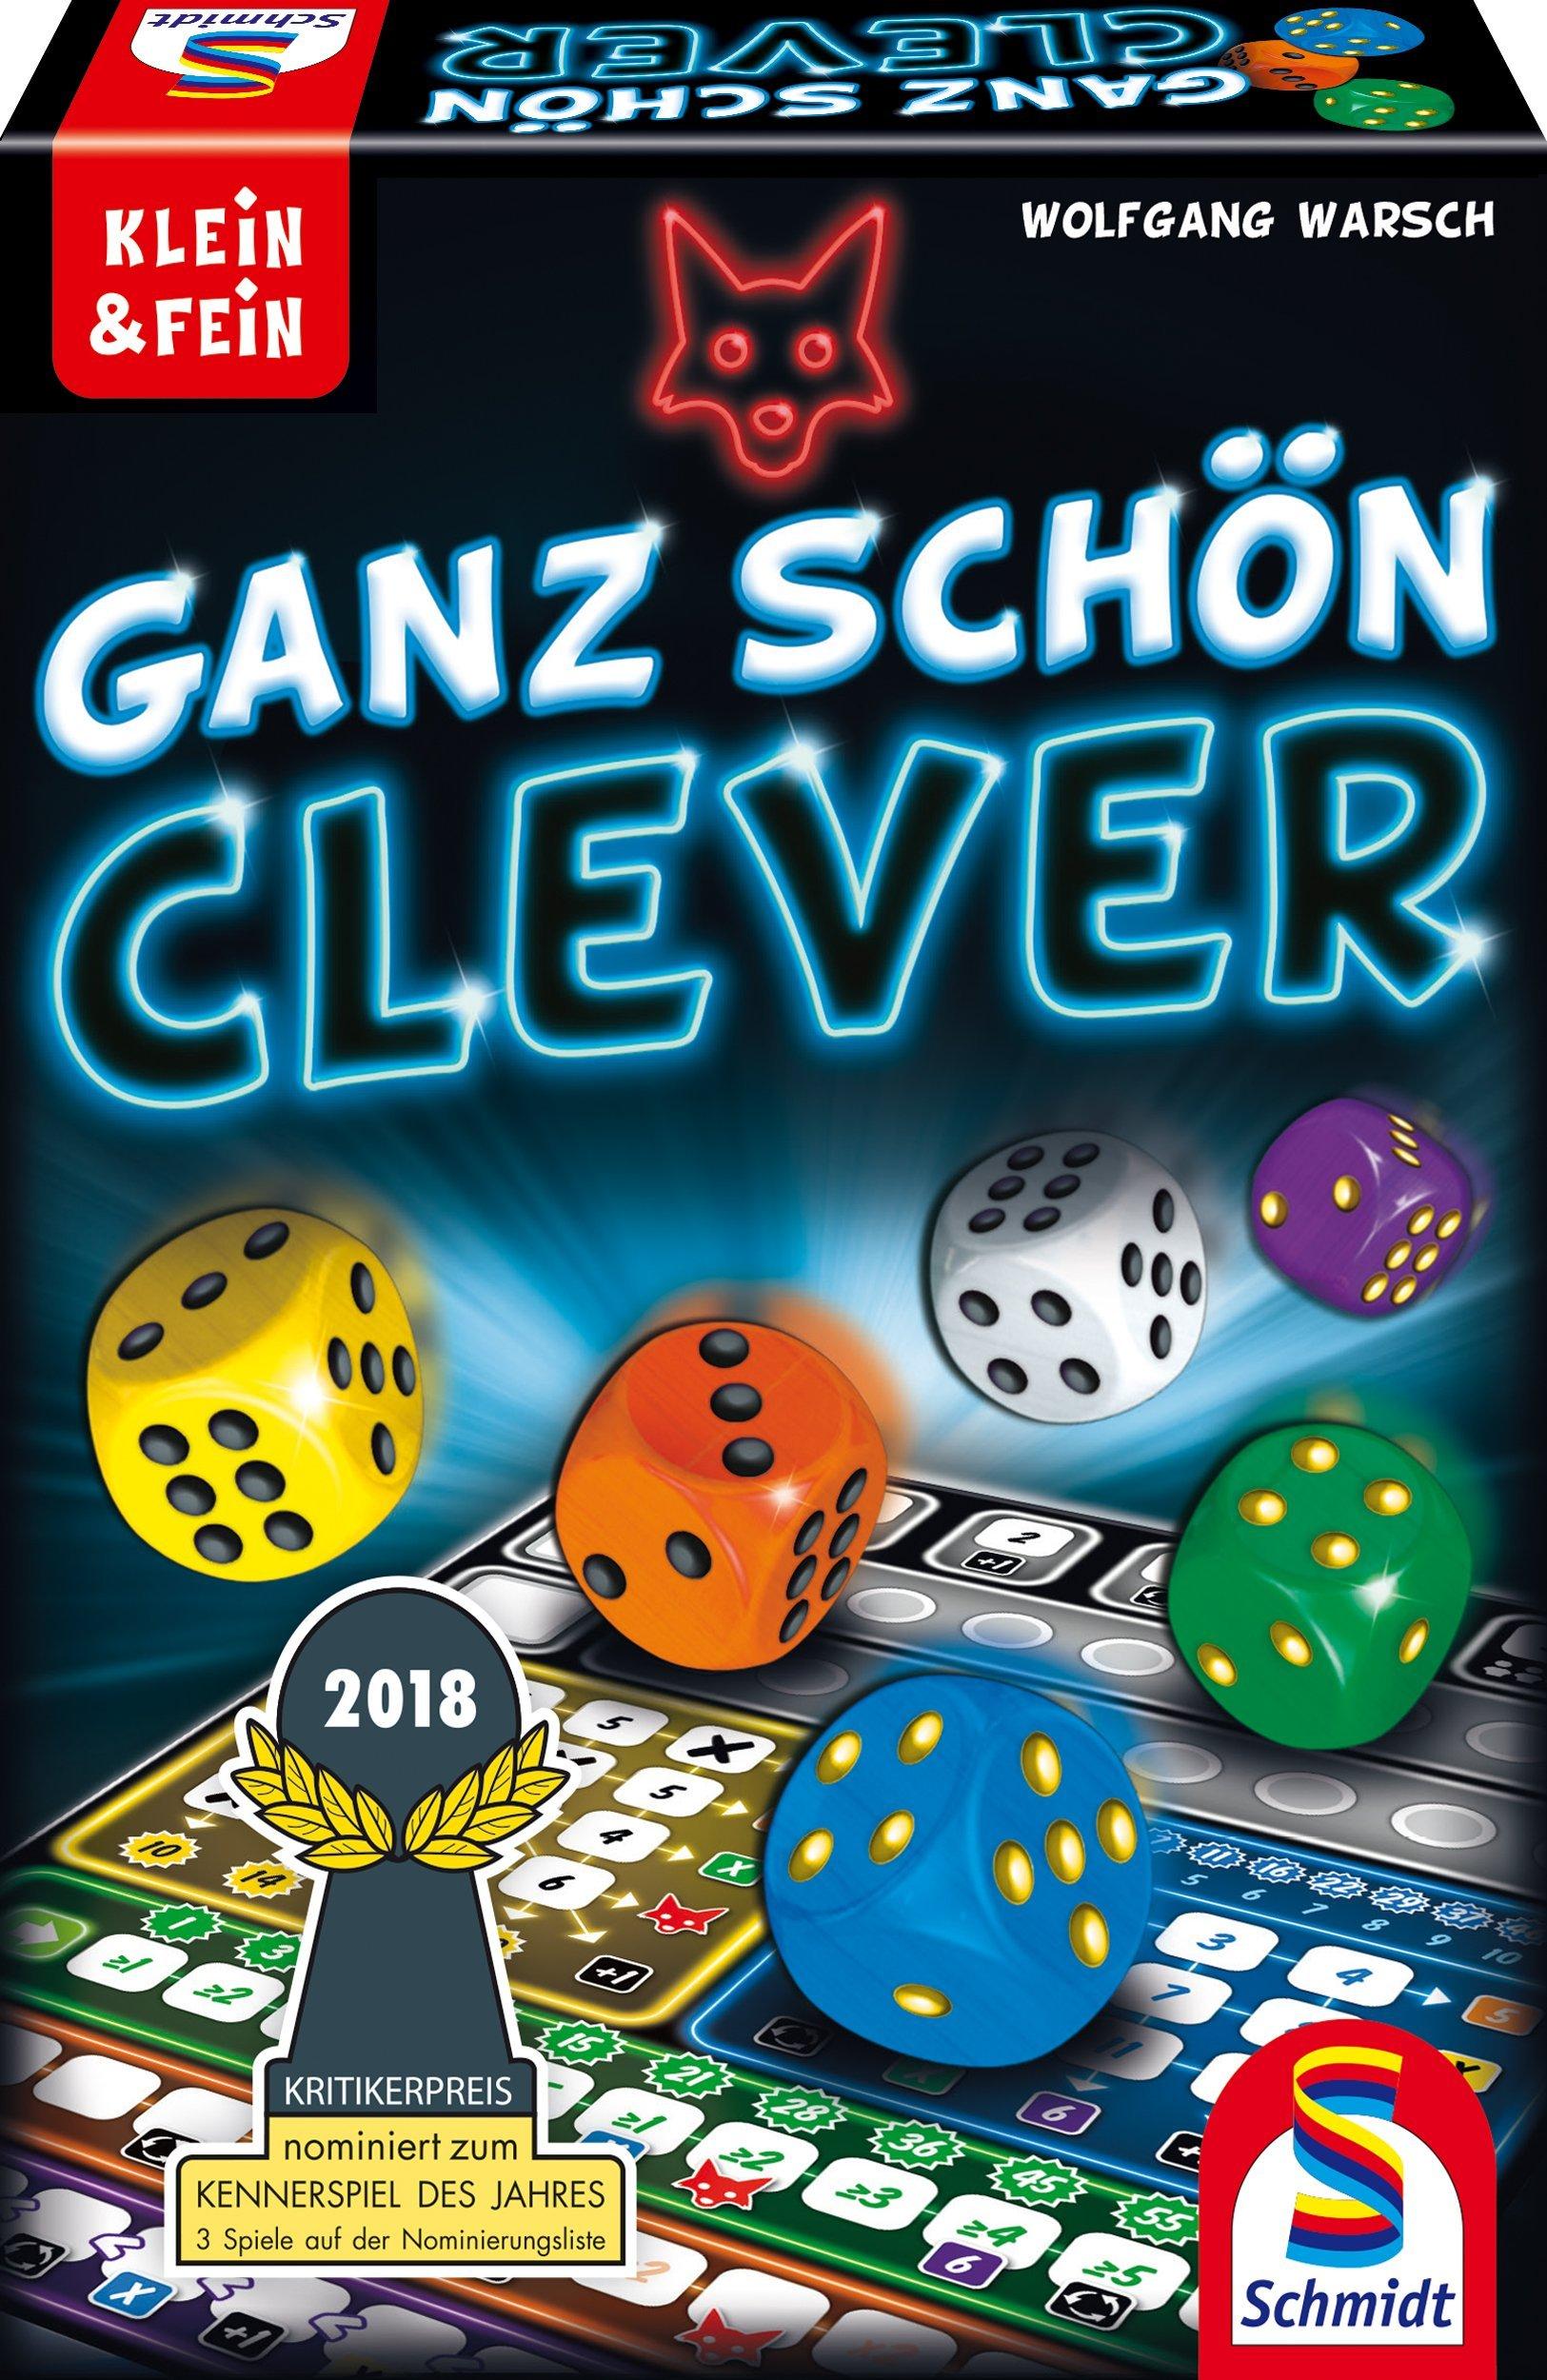 Schmidt Spiele 49340'' Very Clever Game